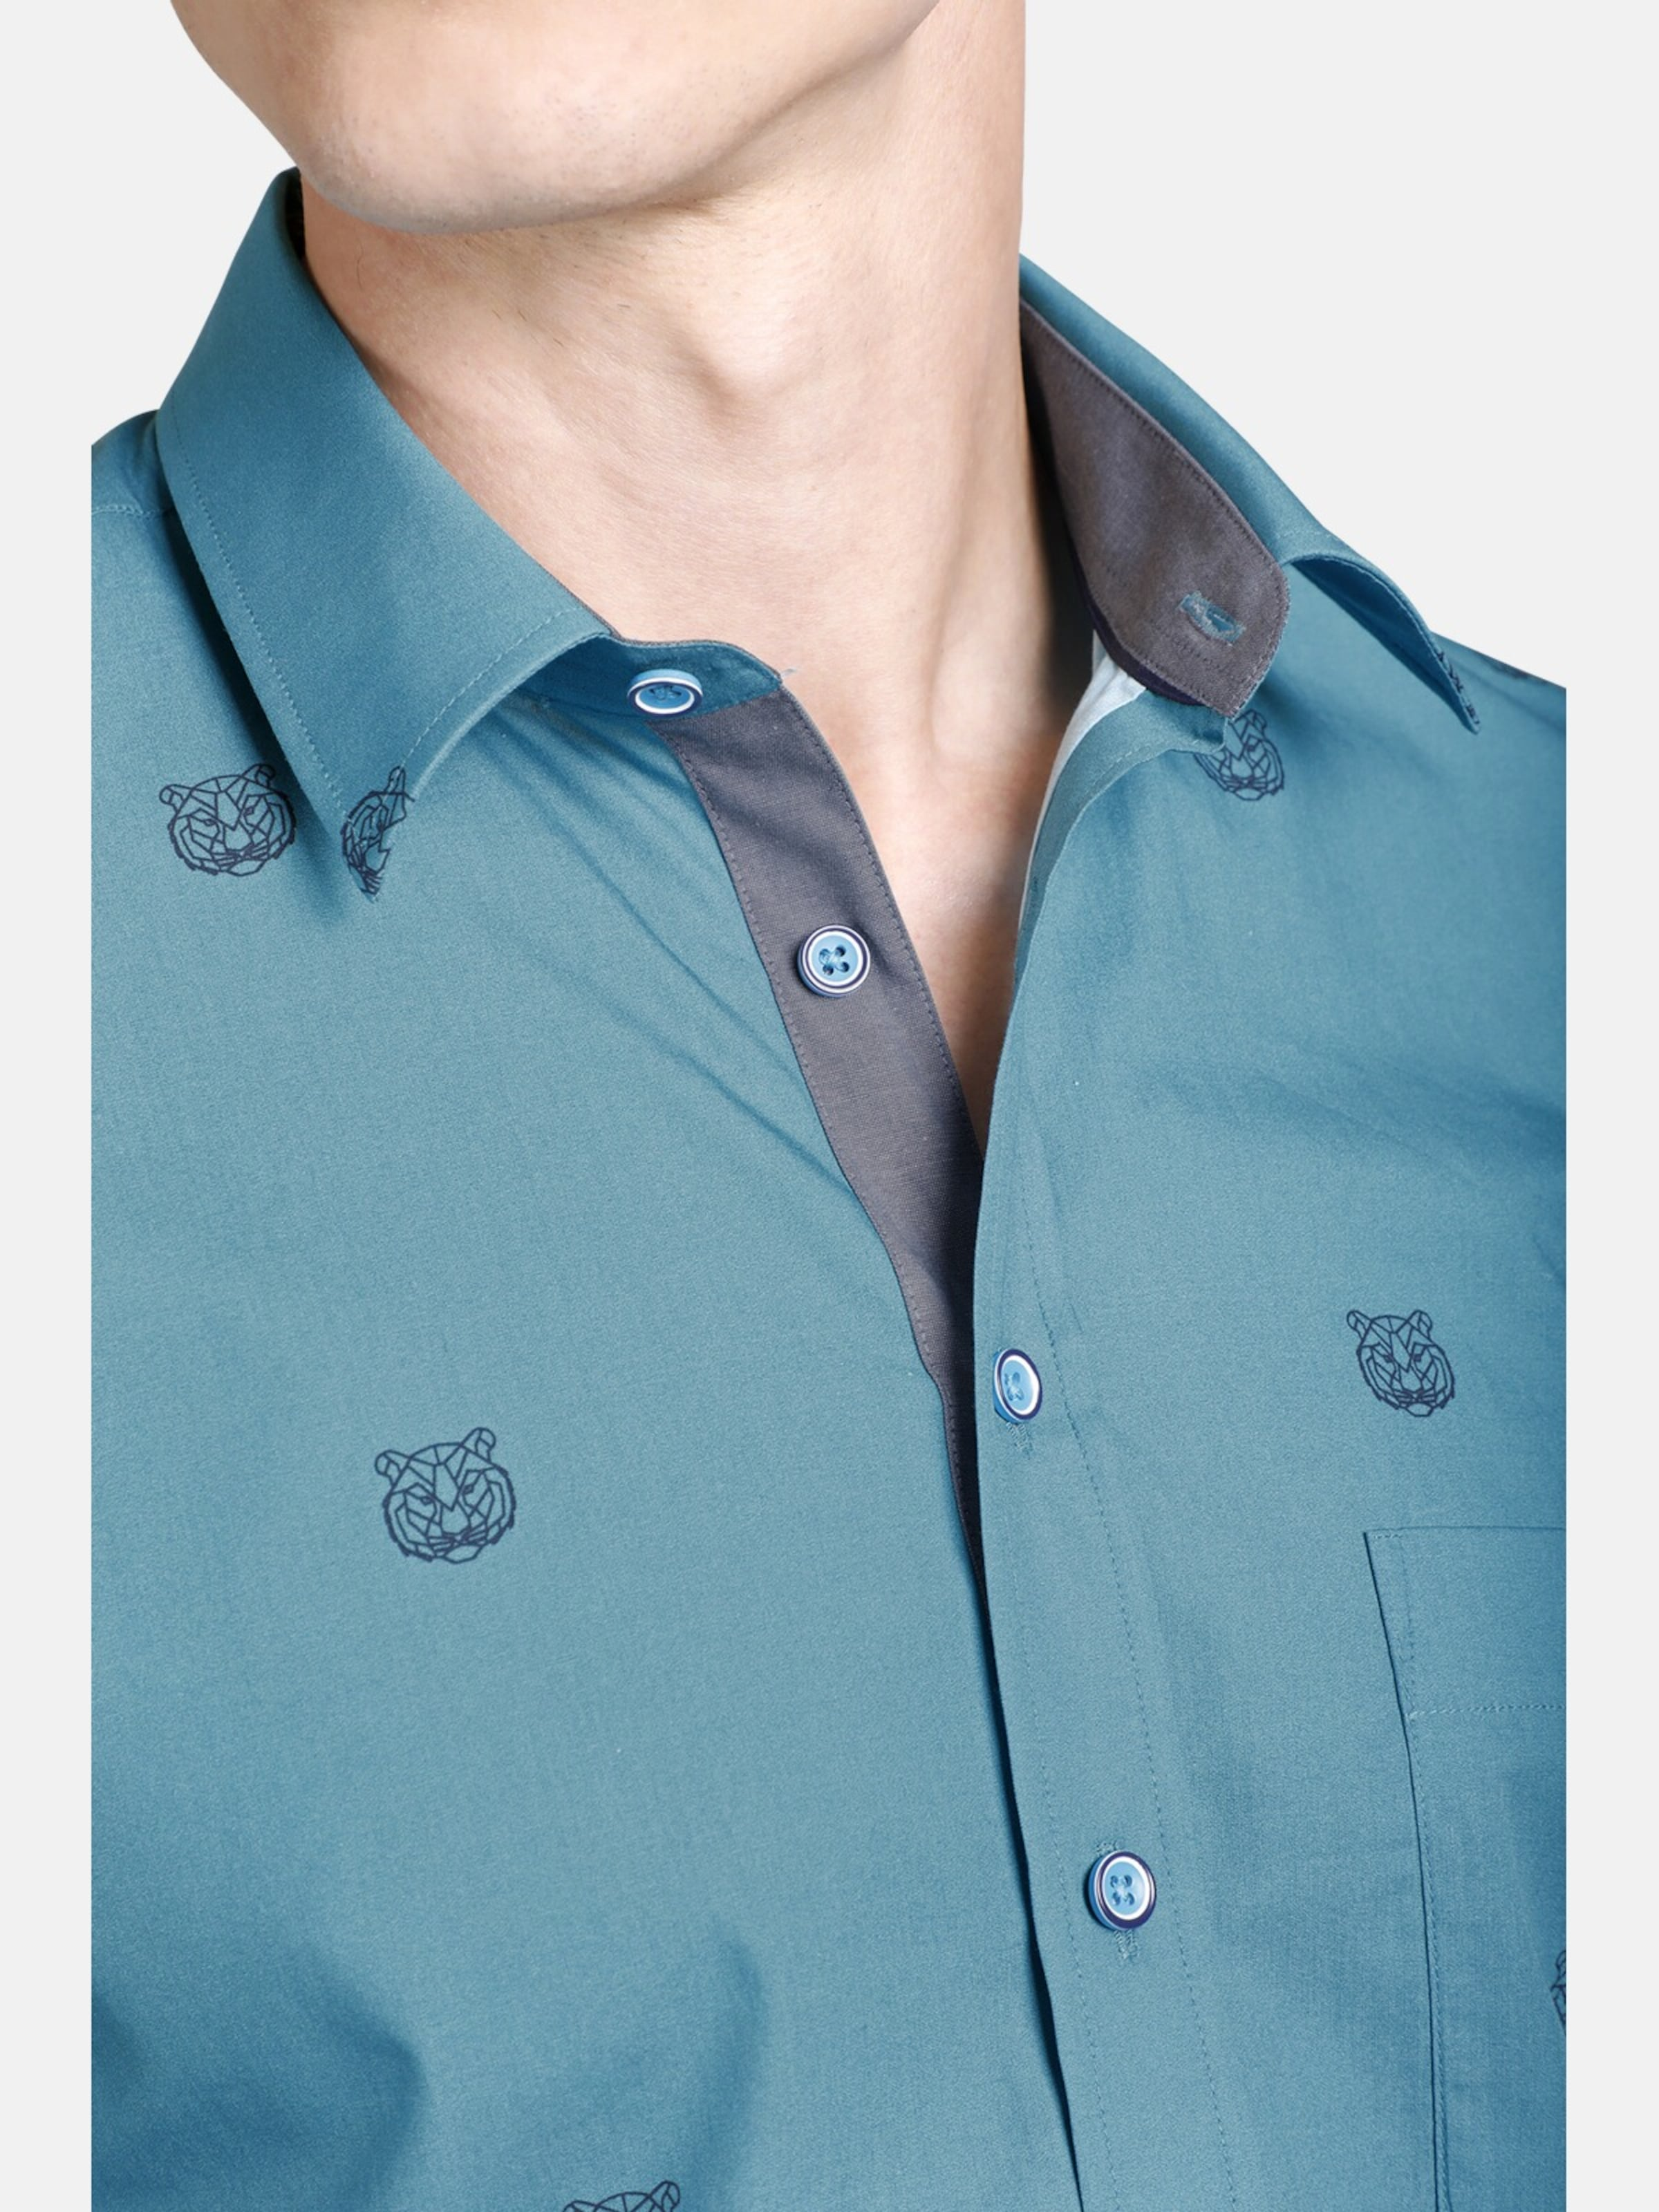 Hemd Tigerhead Shirtmaster ' In Blau OZPikXuT